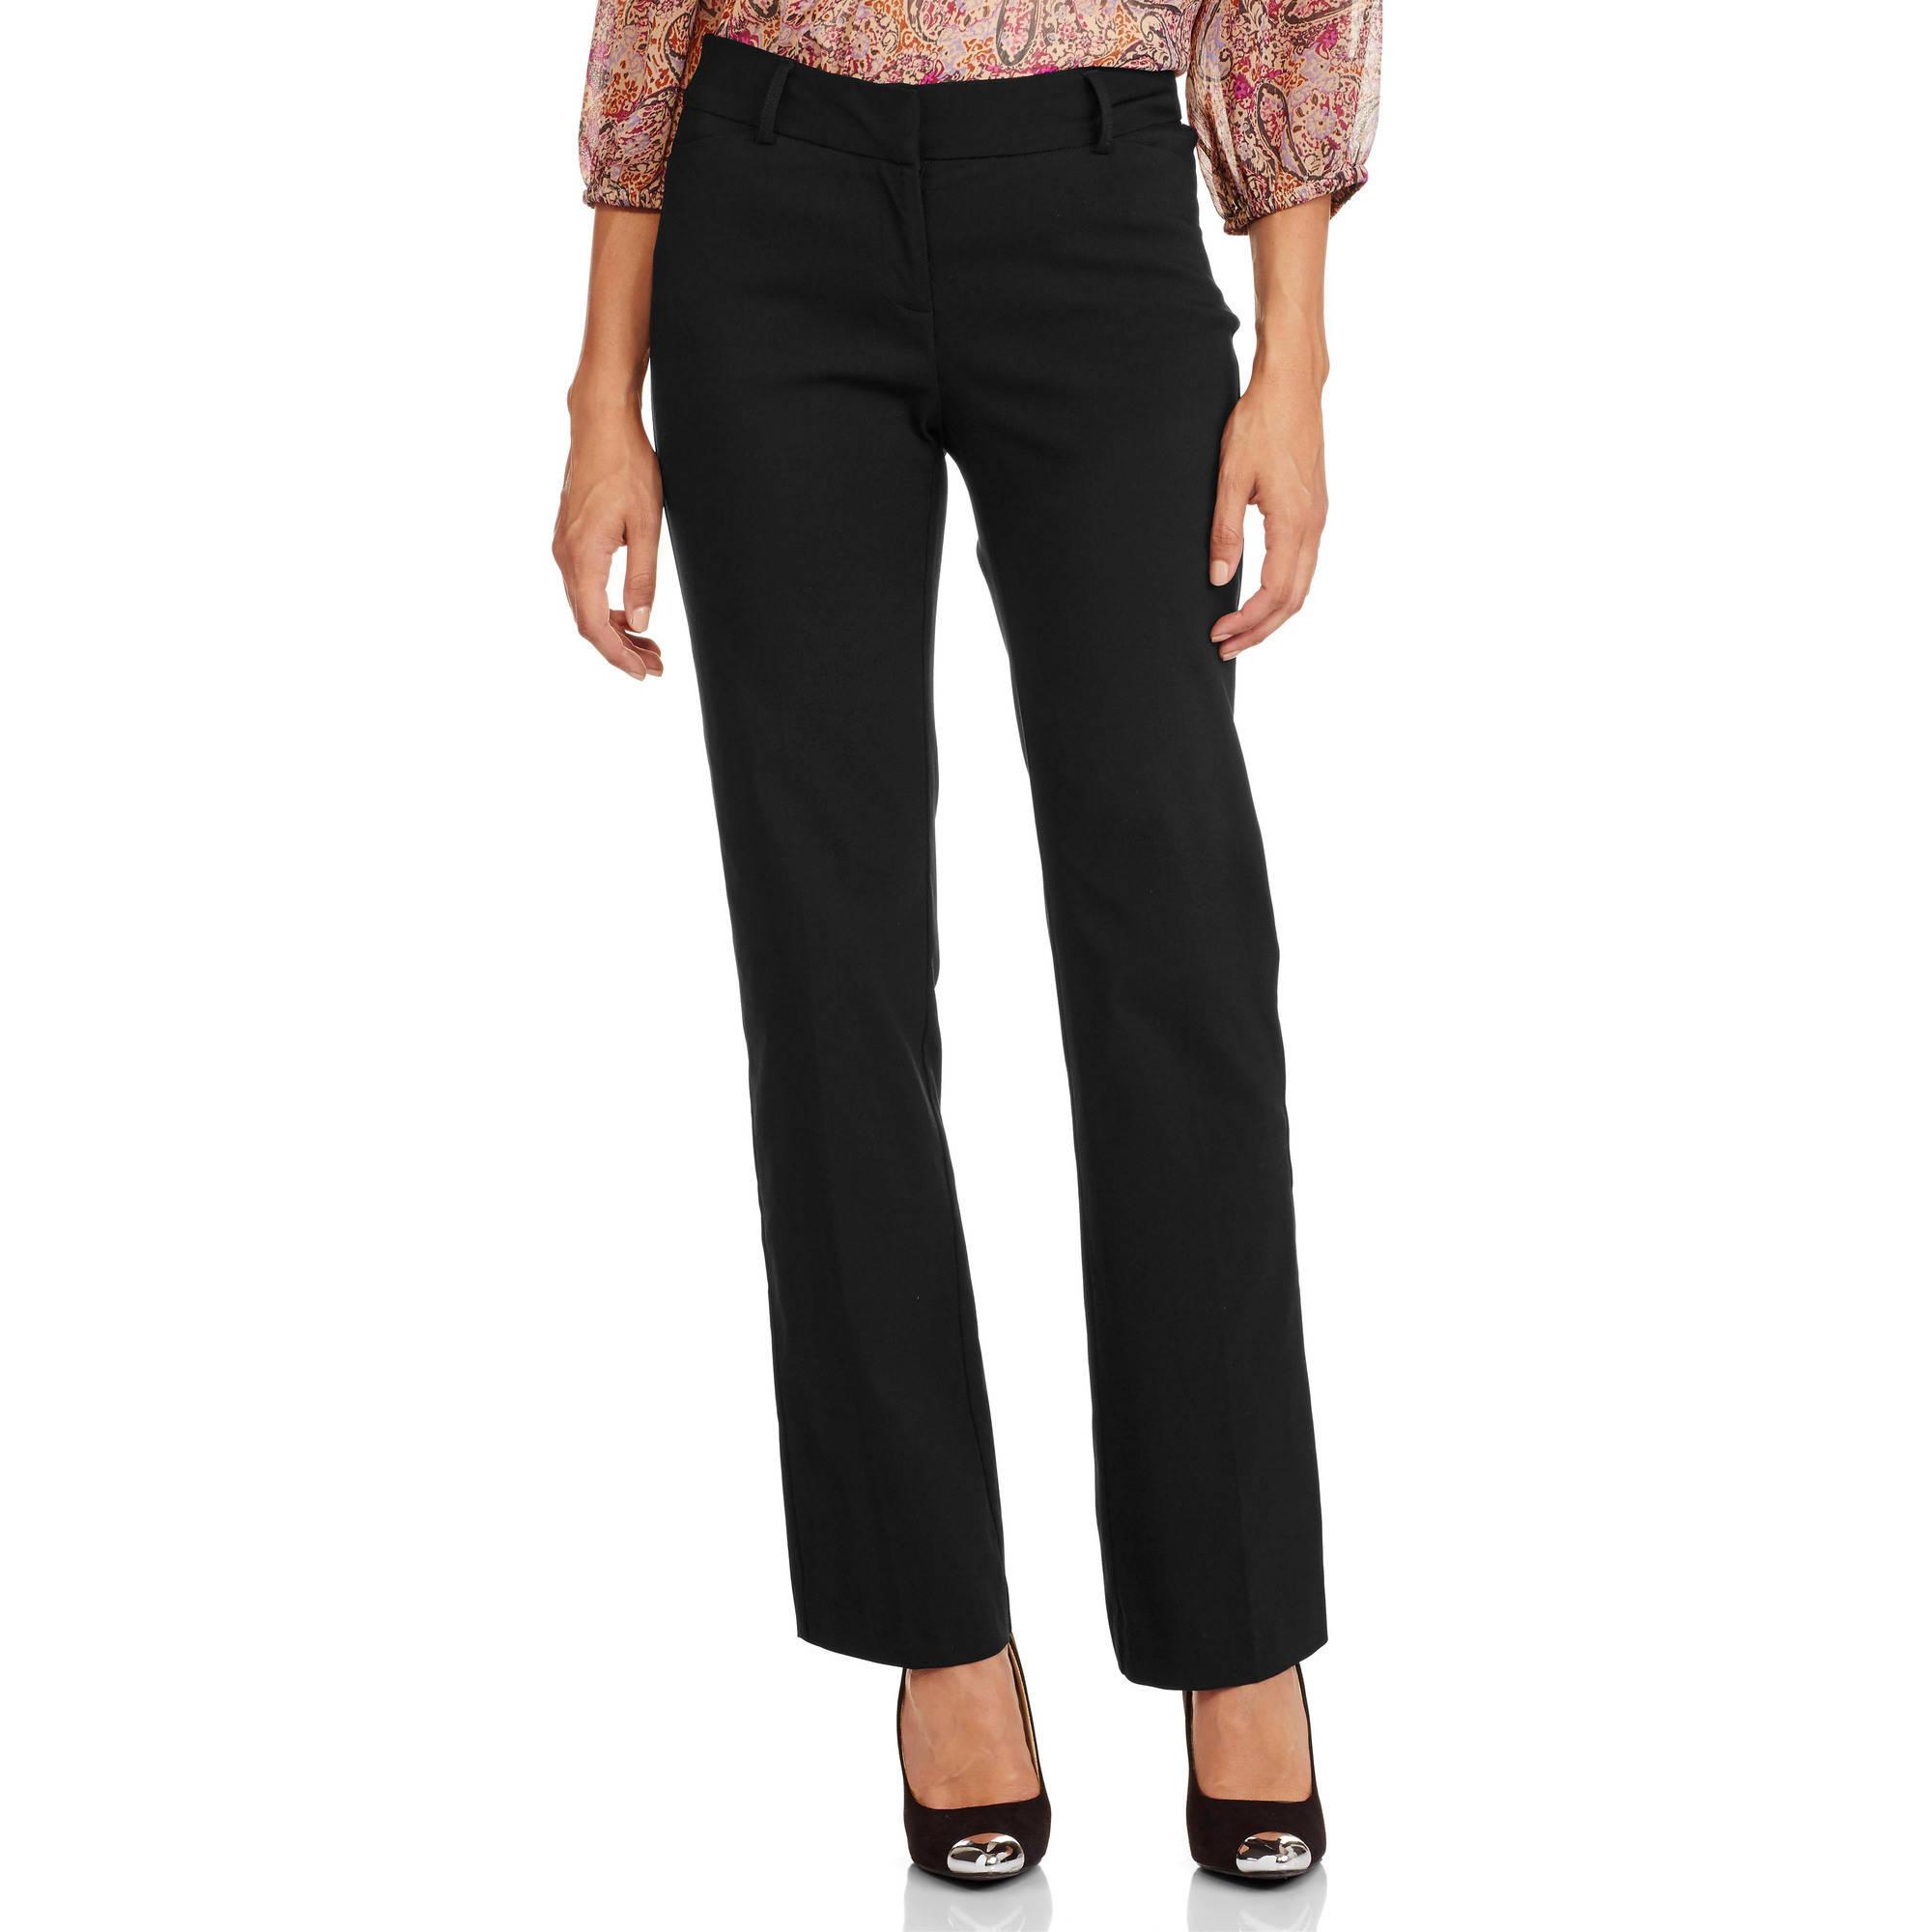 George Women's Millenium Skinny Pant